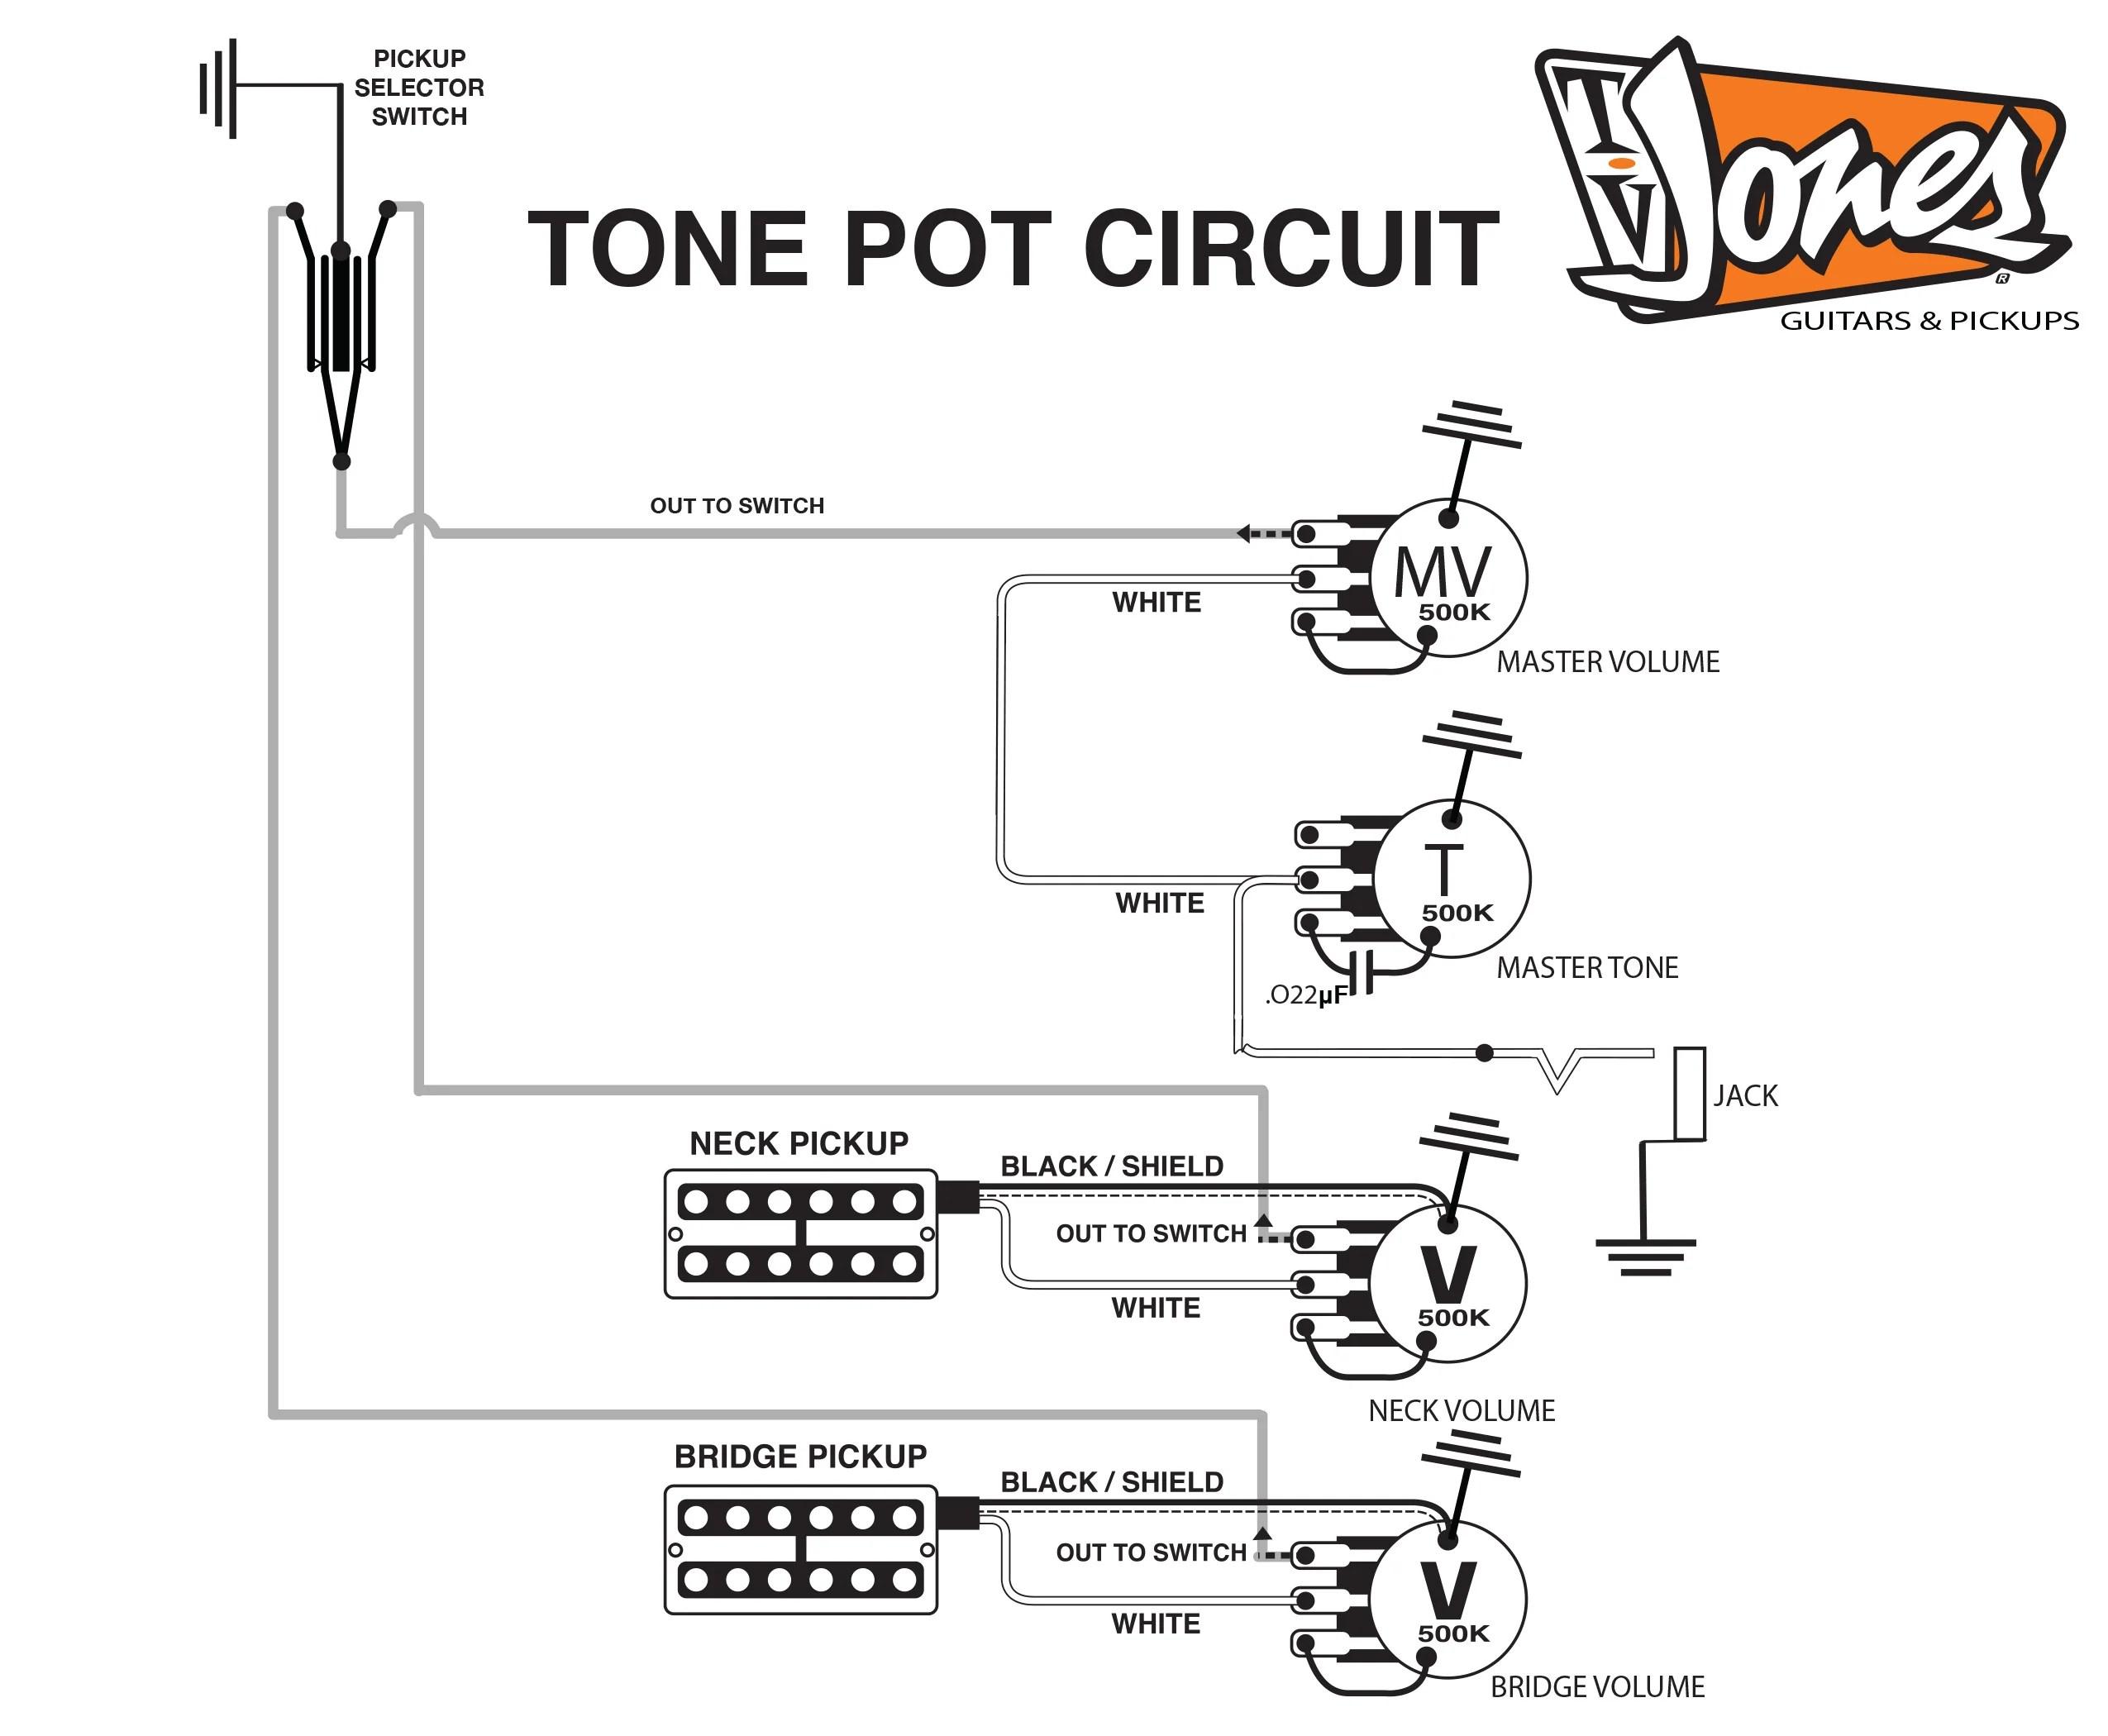 1971 triumph bonneville wiring diagram 1999 dodge durango infinity stereo t90 schematic uwy vipie de u2022 t120r